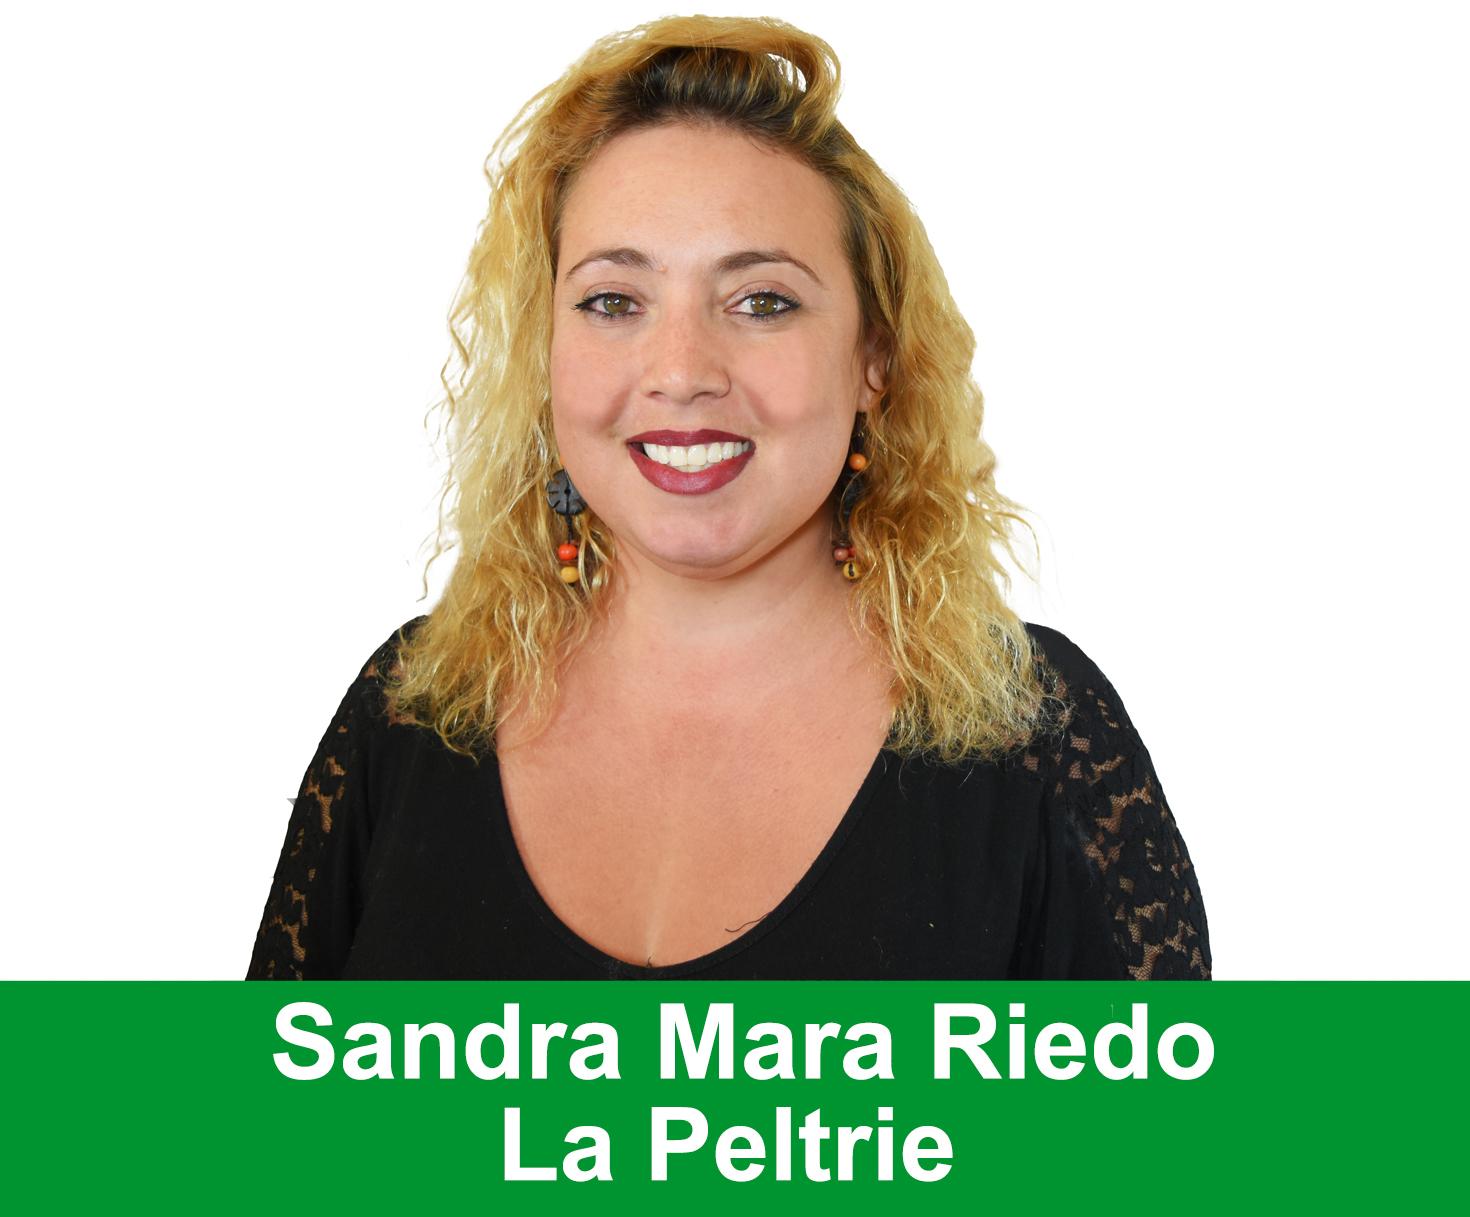 SandraMaraRiedoWEB.jpg